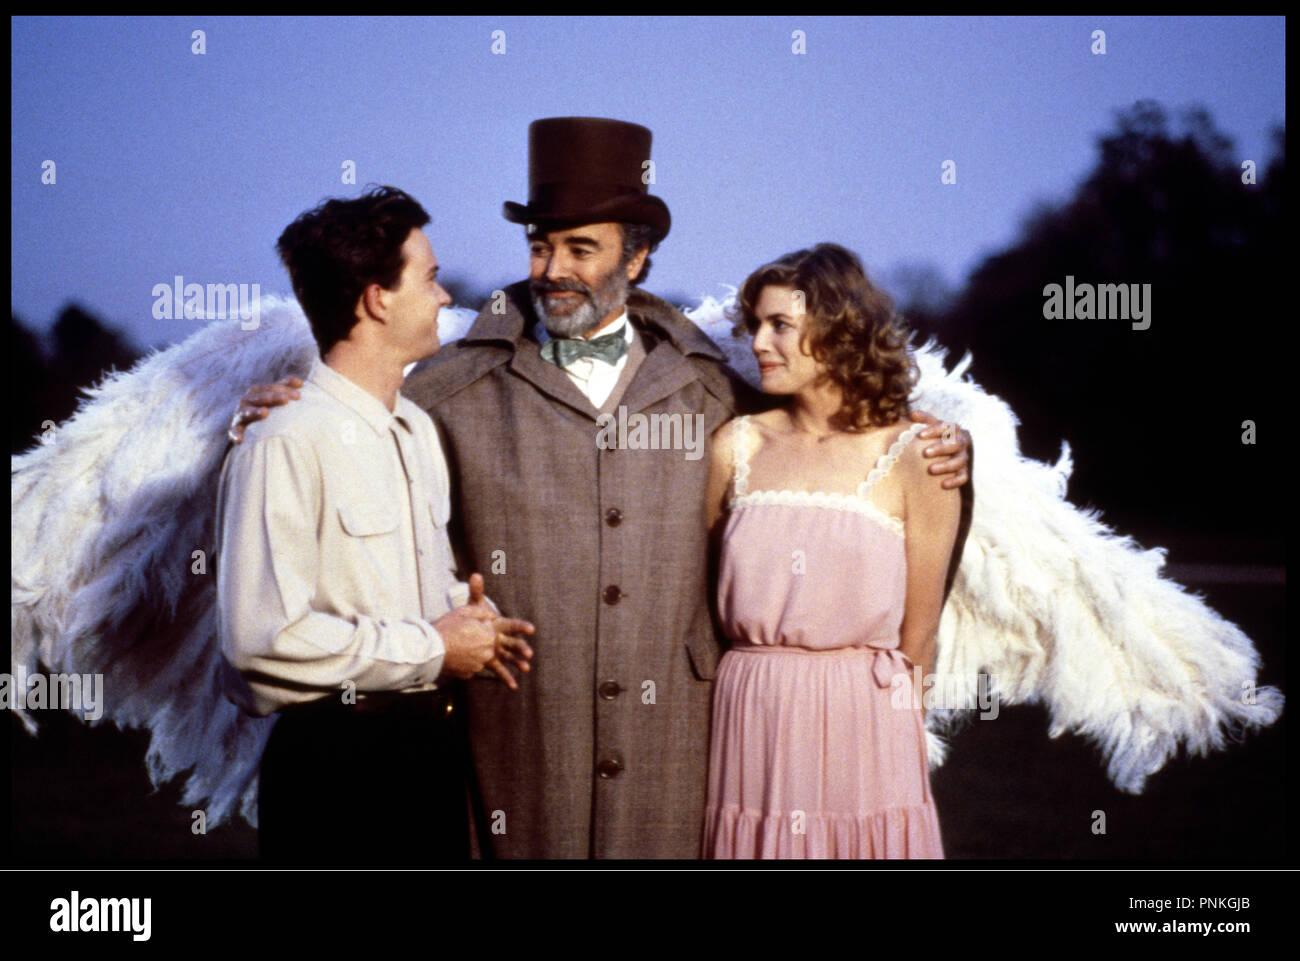 Prod Db Lorimar Film Entertainmentdr Made In Heaven Bienvenue Au